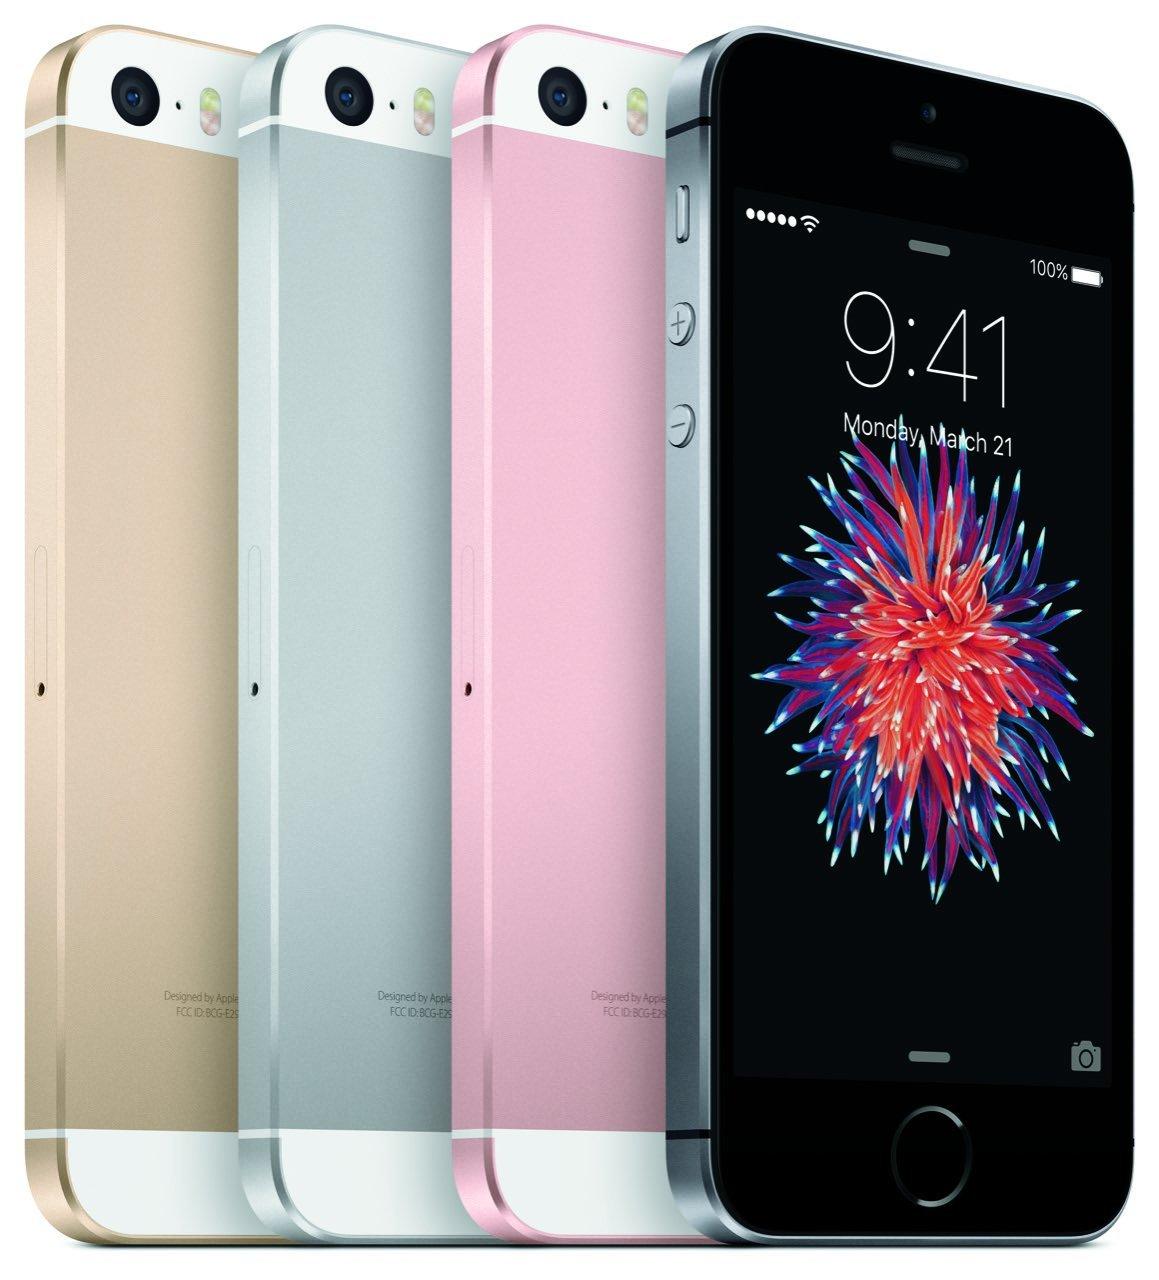 iPhone SE Farben (Gold, Silber, Rosegold, Space-Grau)